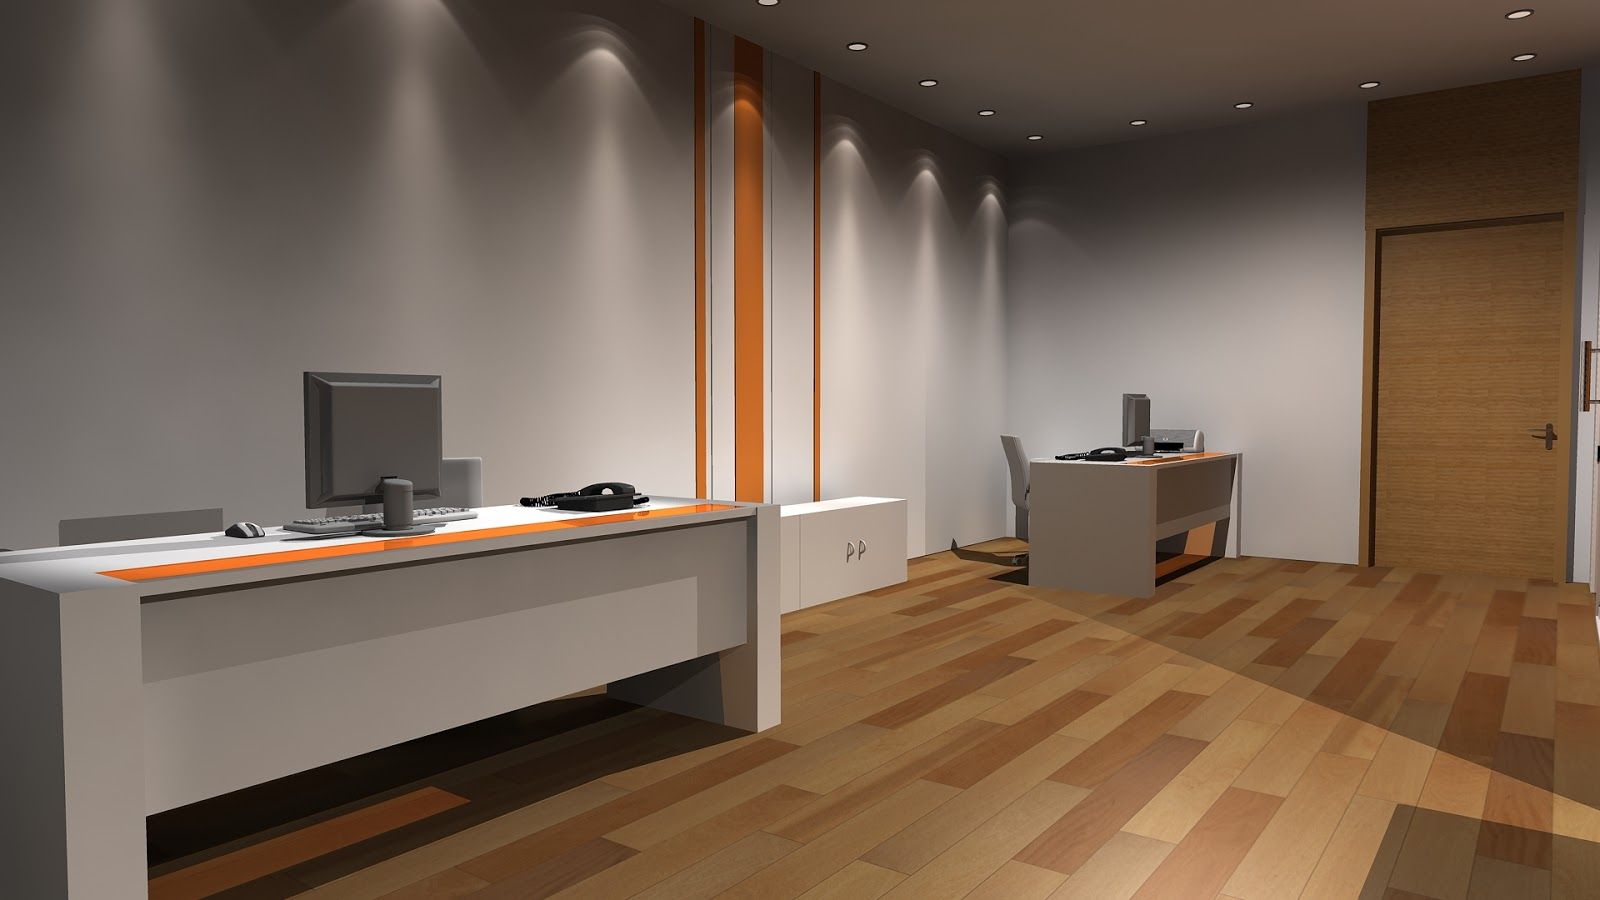 Sajid designer interior design office 3ds max for Office design 3d max